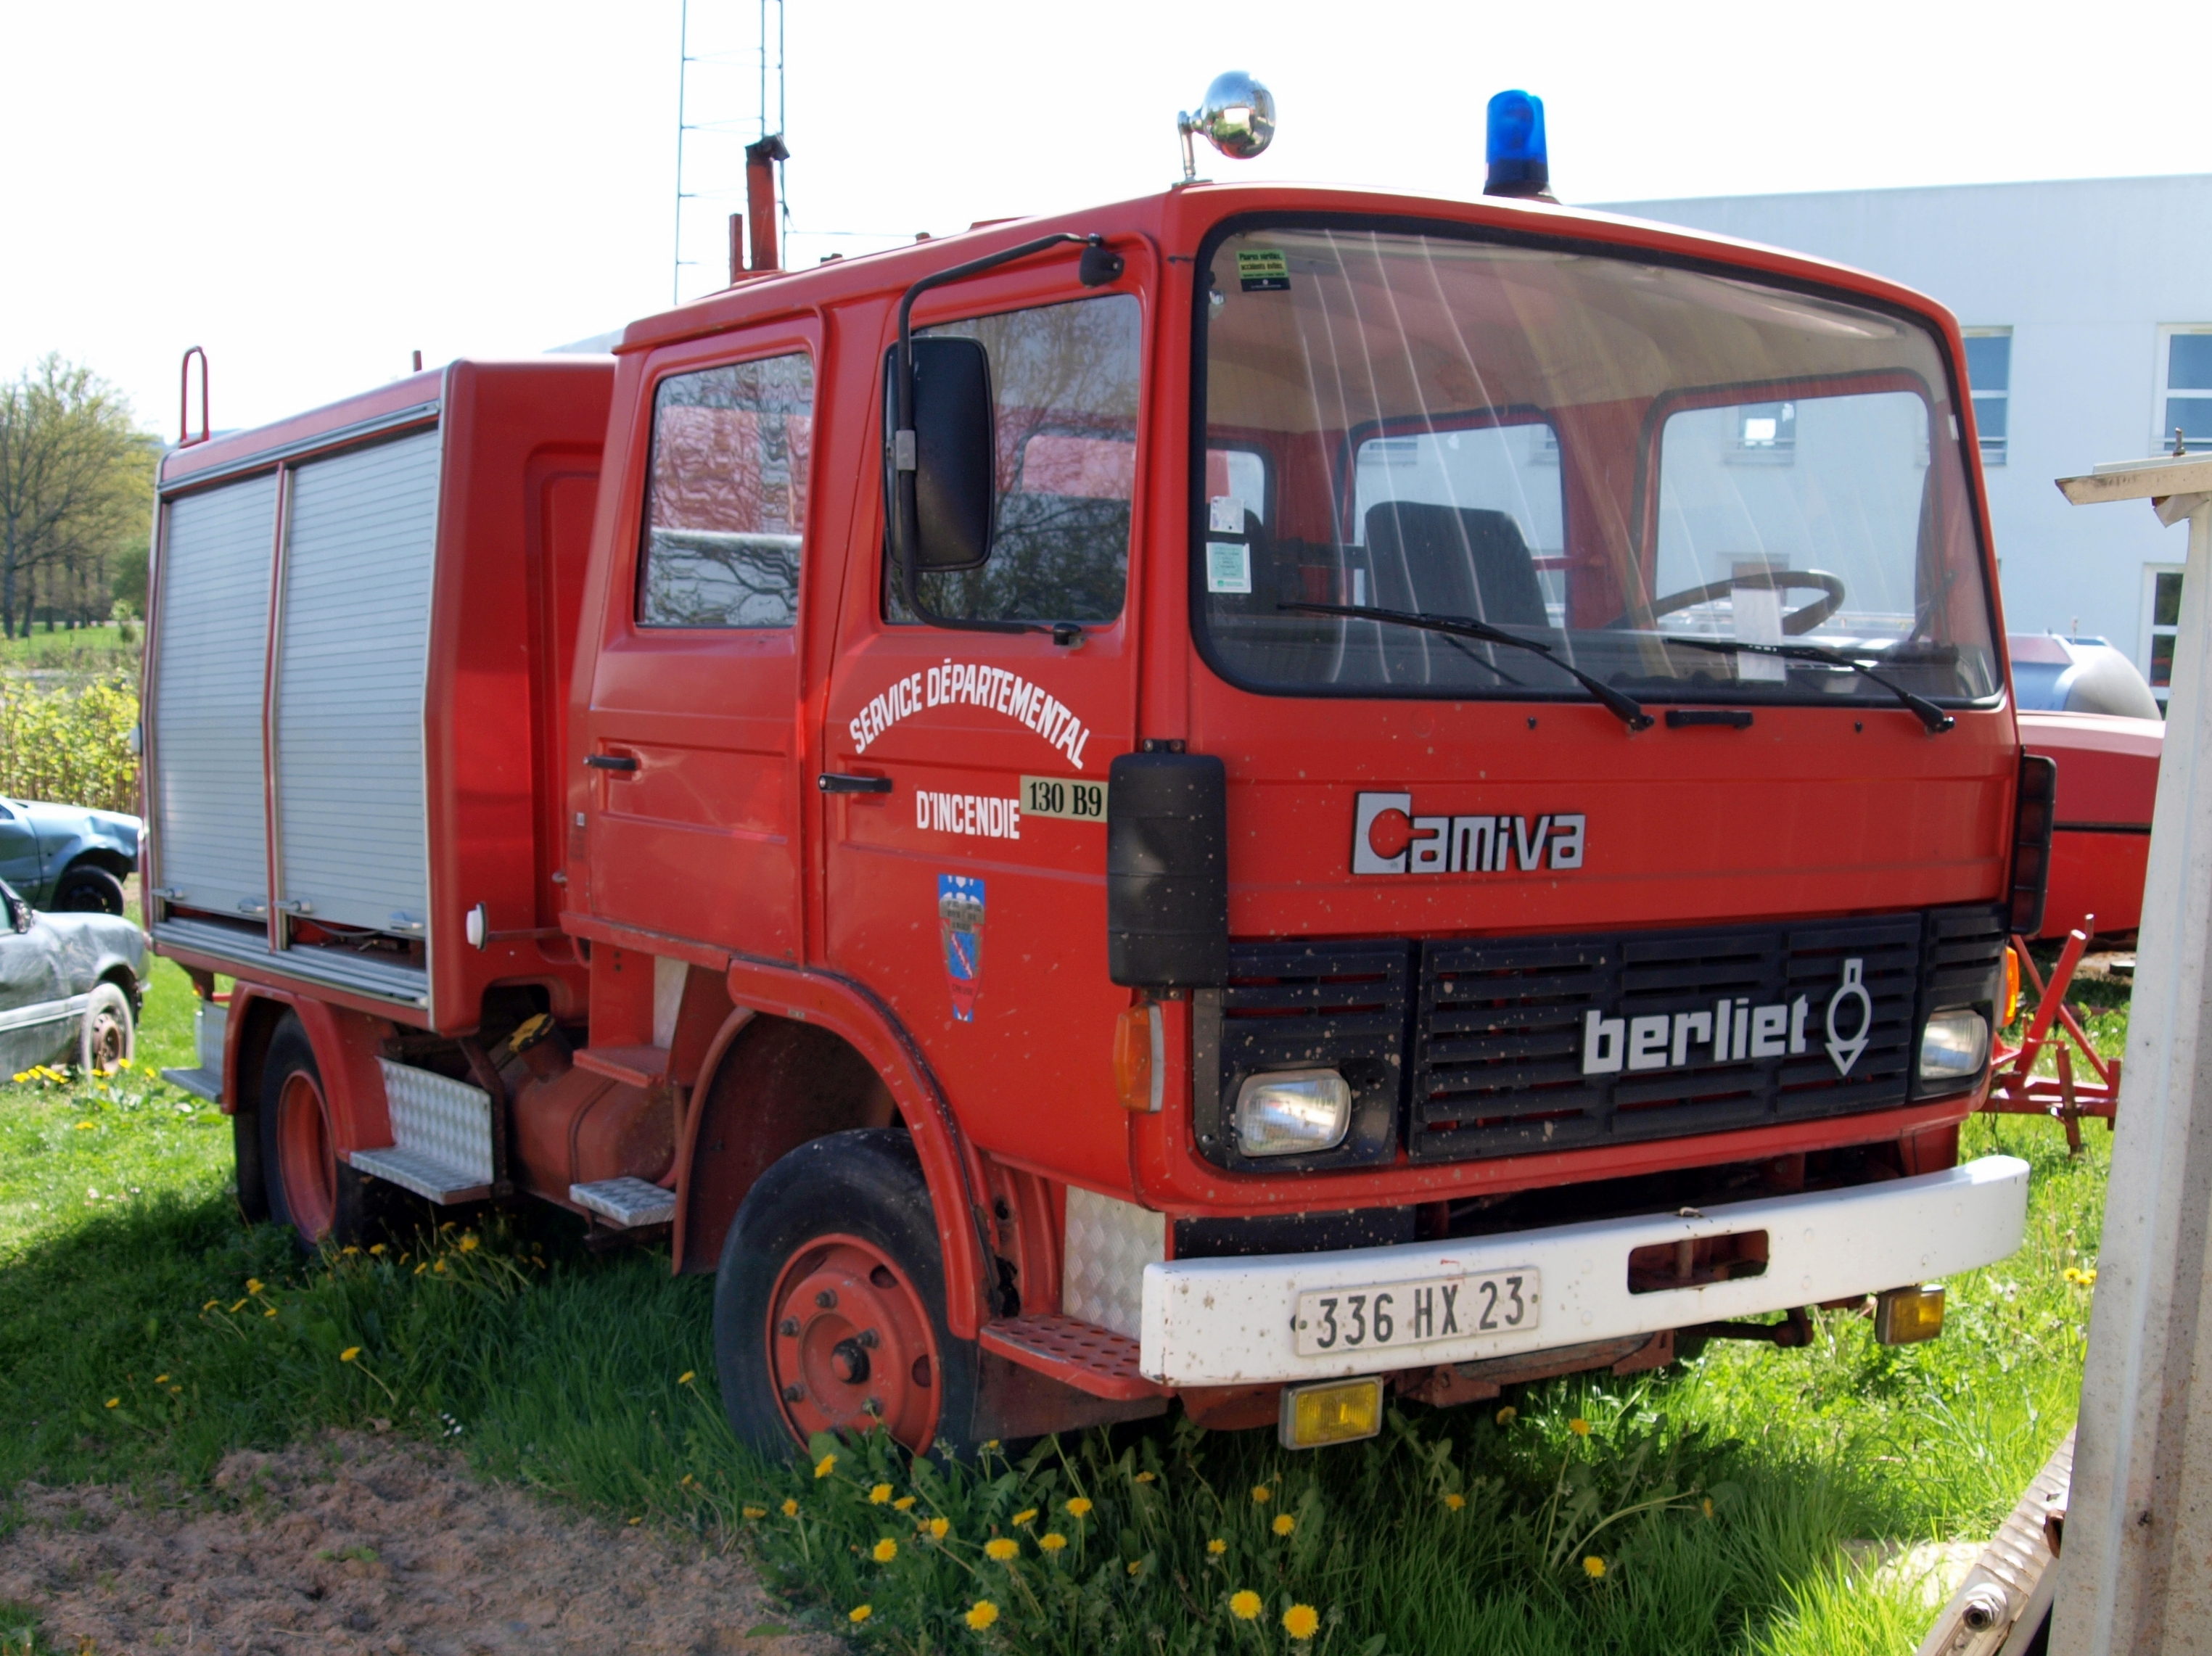 Datei:Berliet 130 B9, ...